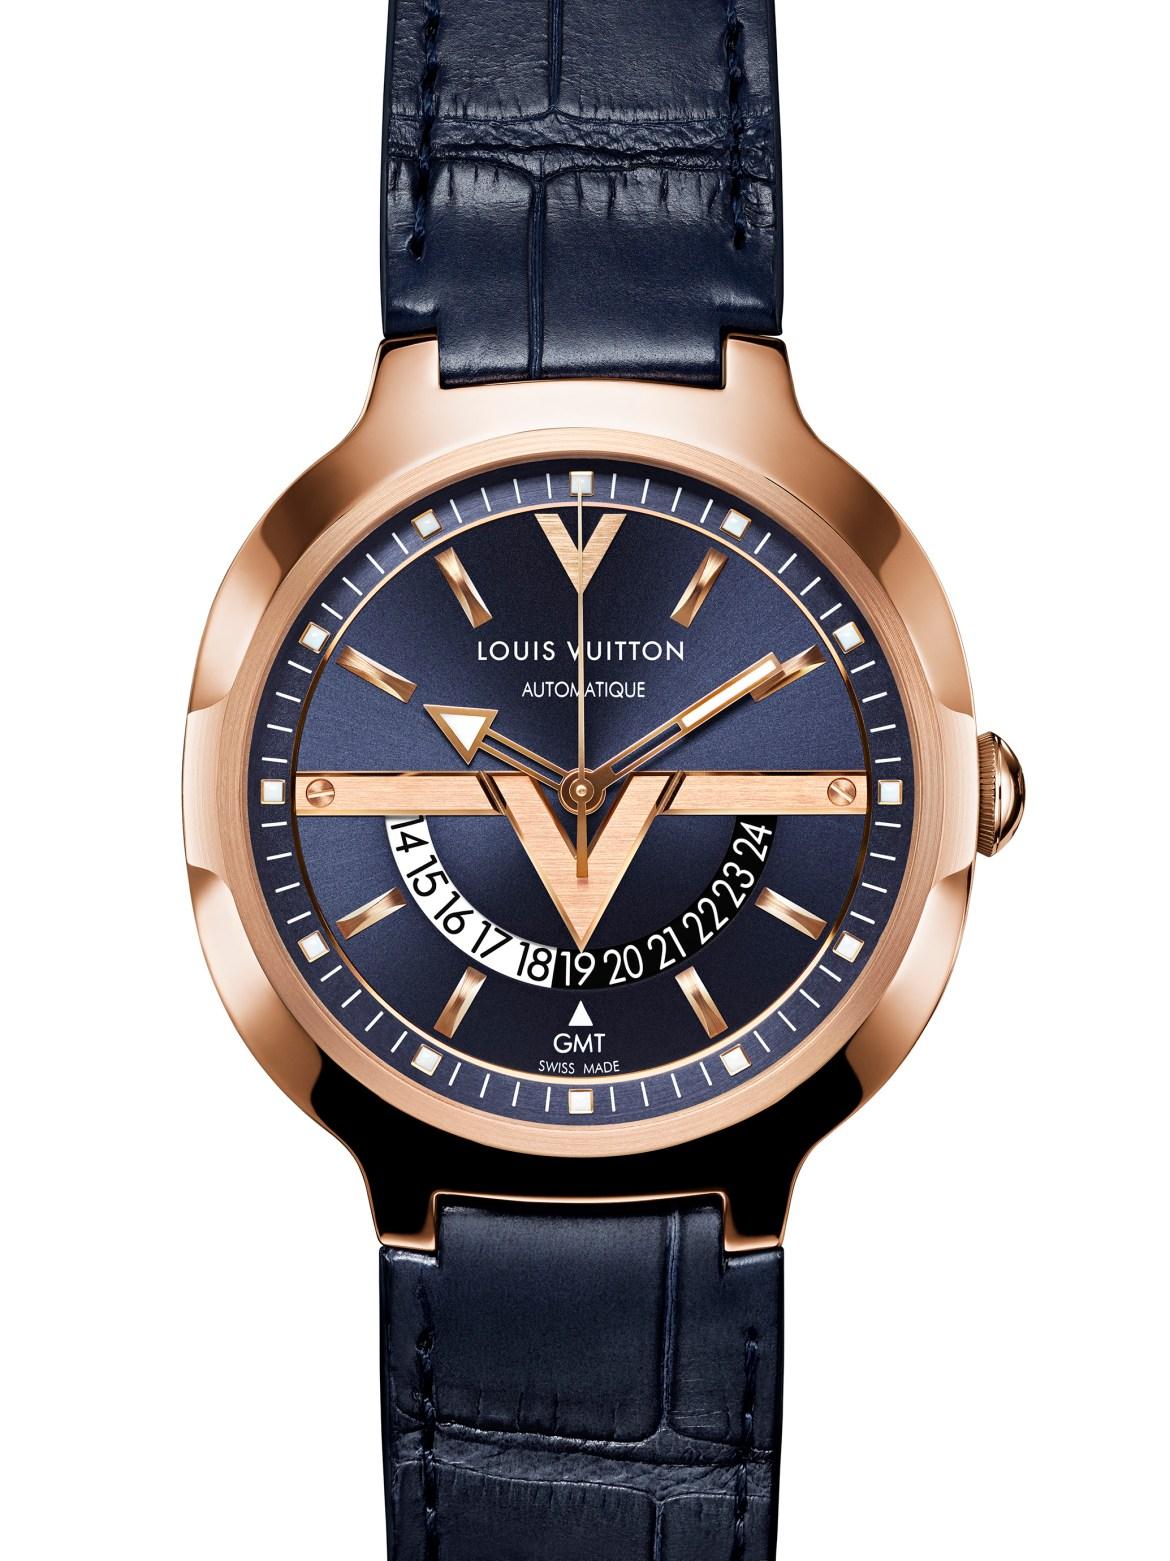 Louis Vuitton - GMT Pink Gold